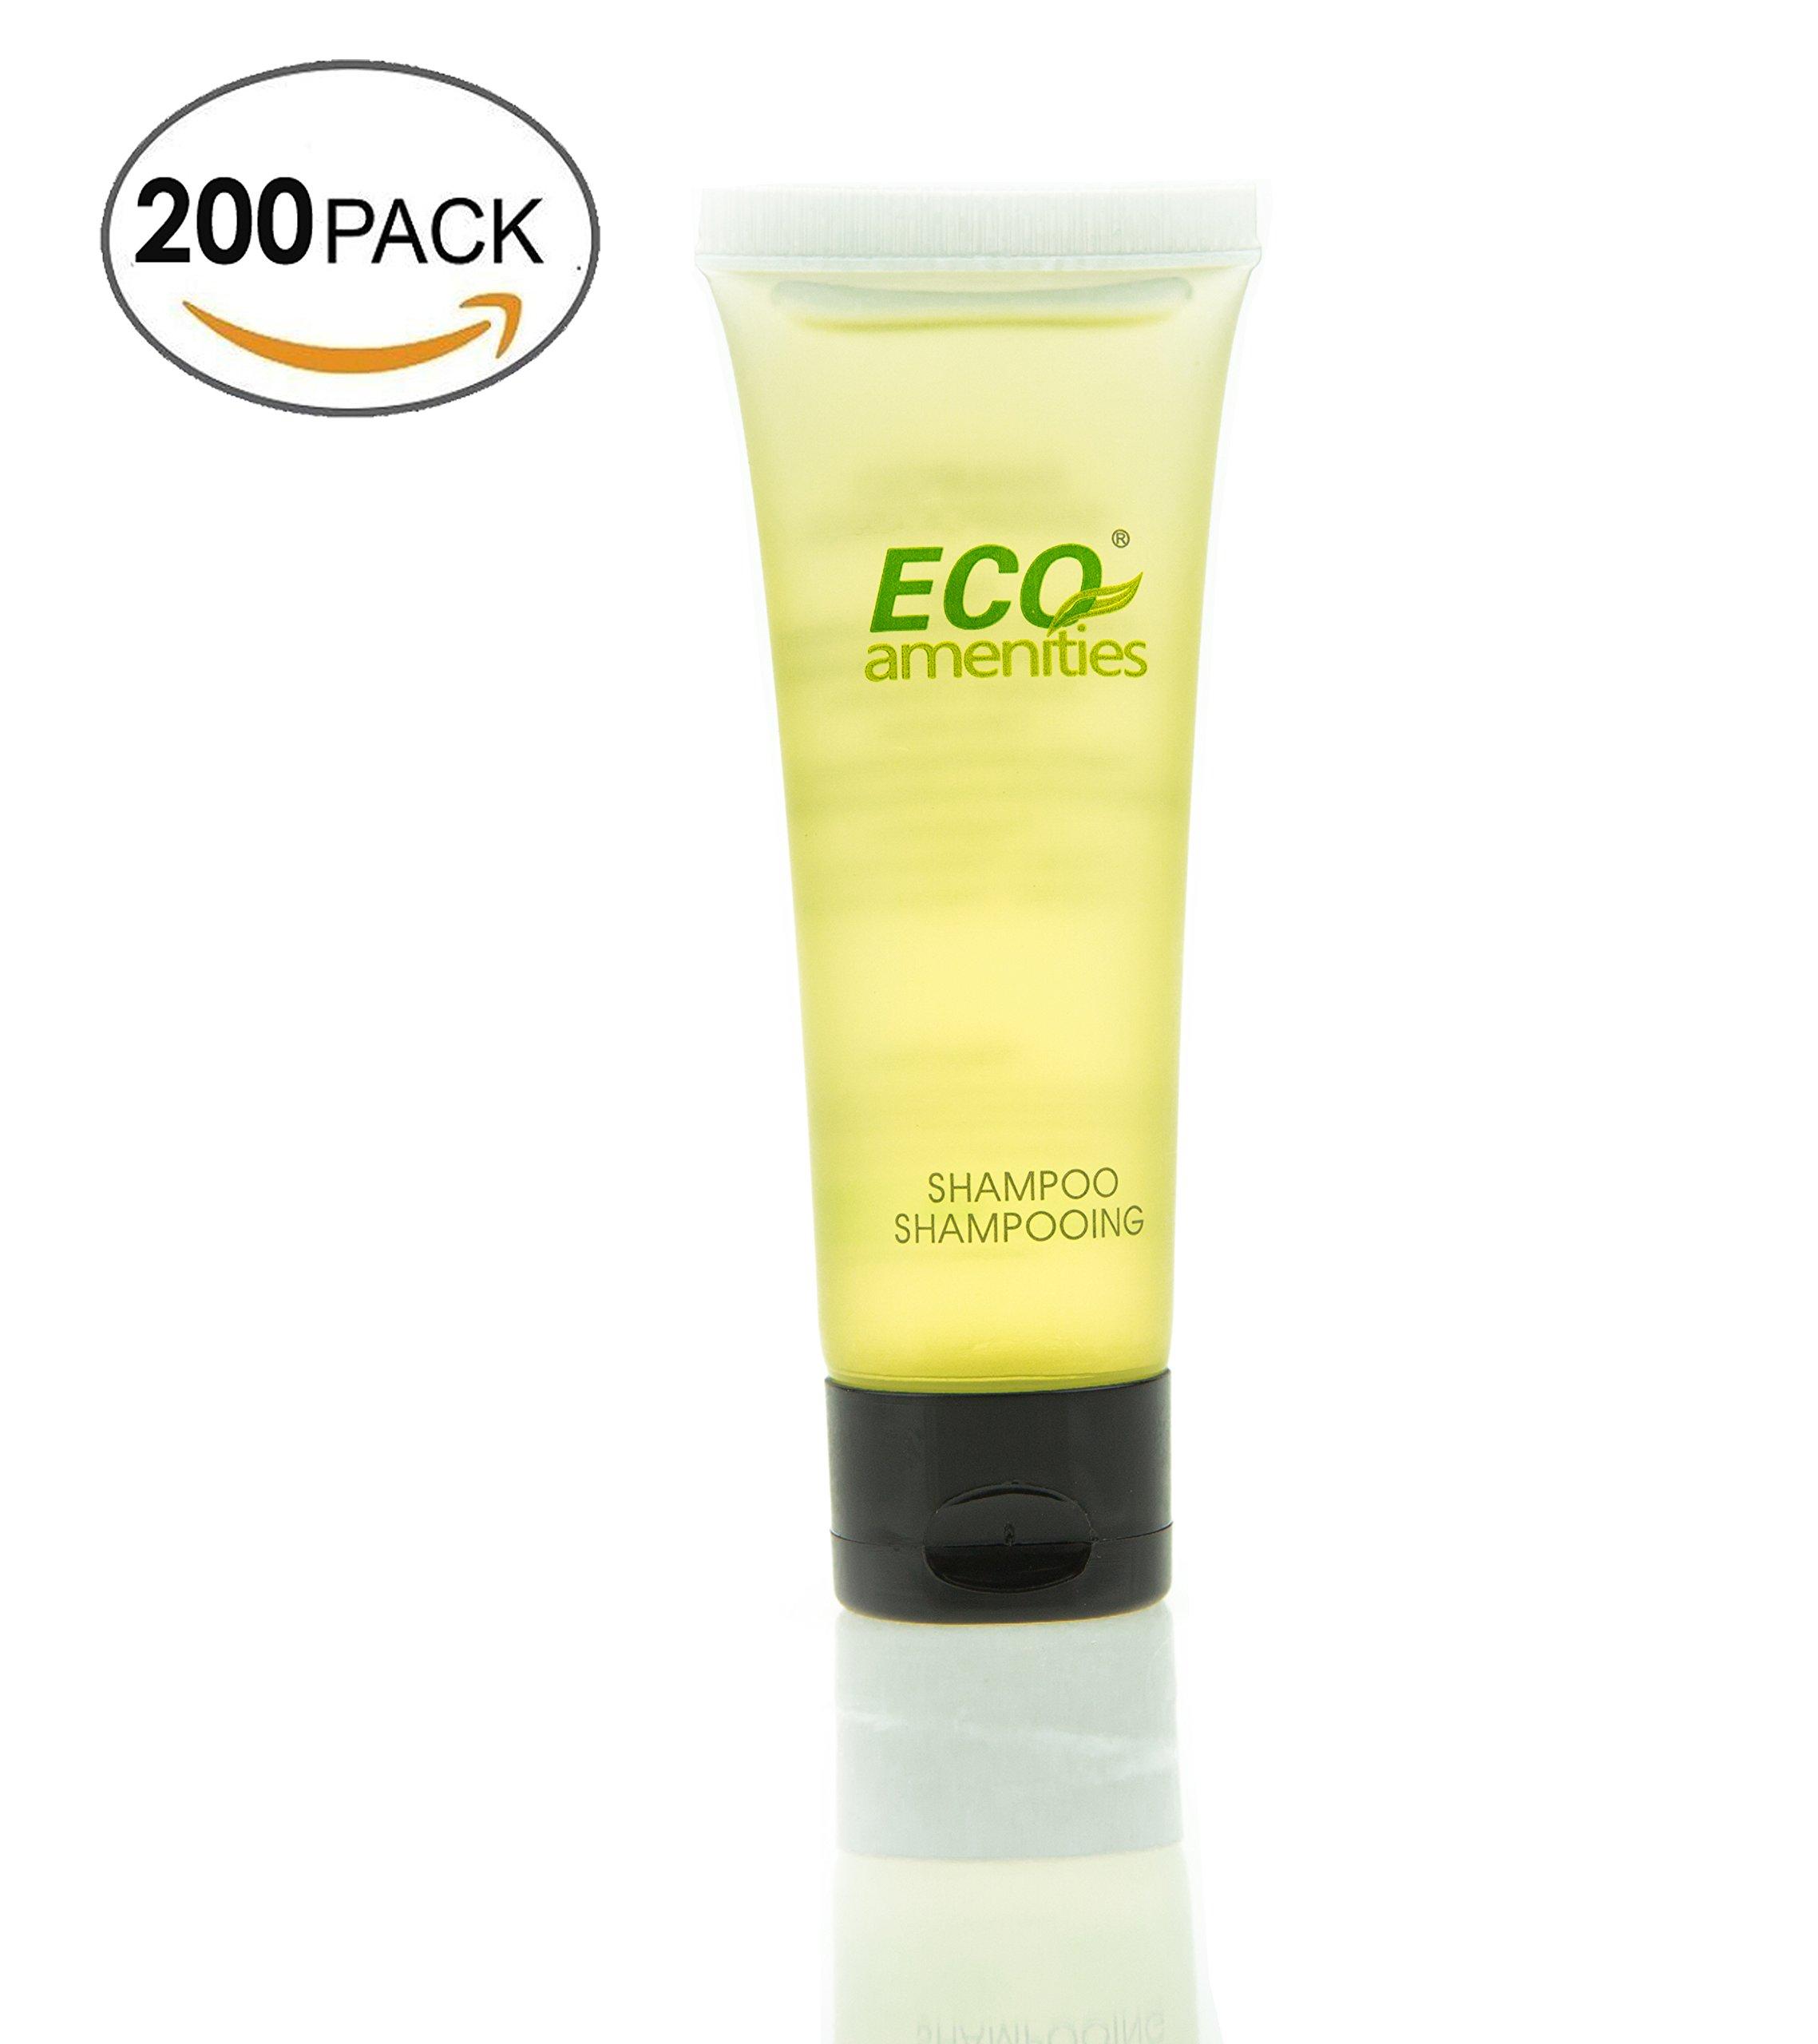 ECO Amenities Transparent Tube Flip Cap Individually Wrapped 30ml Shampoo, 200 Tubes per Case